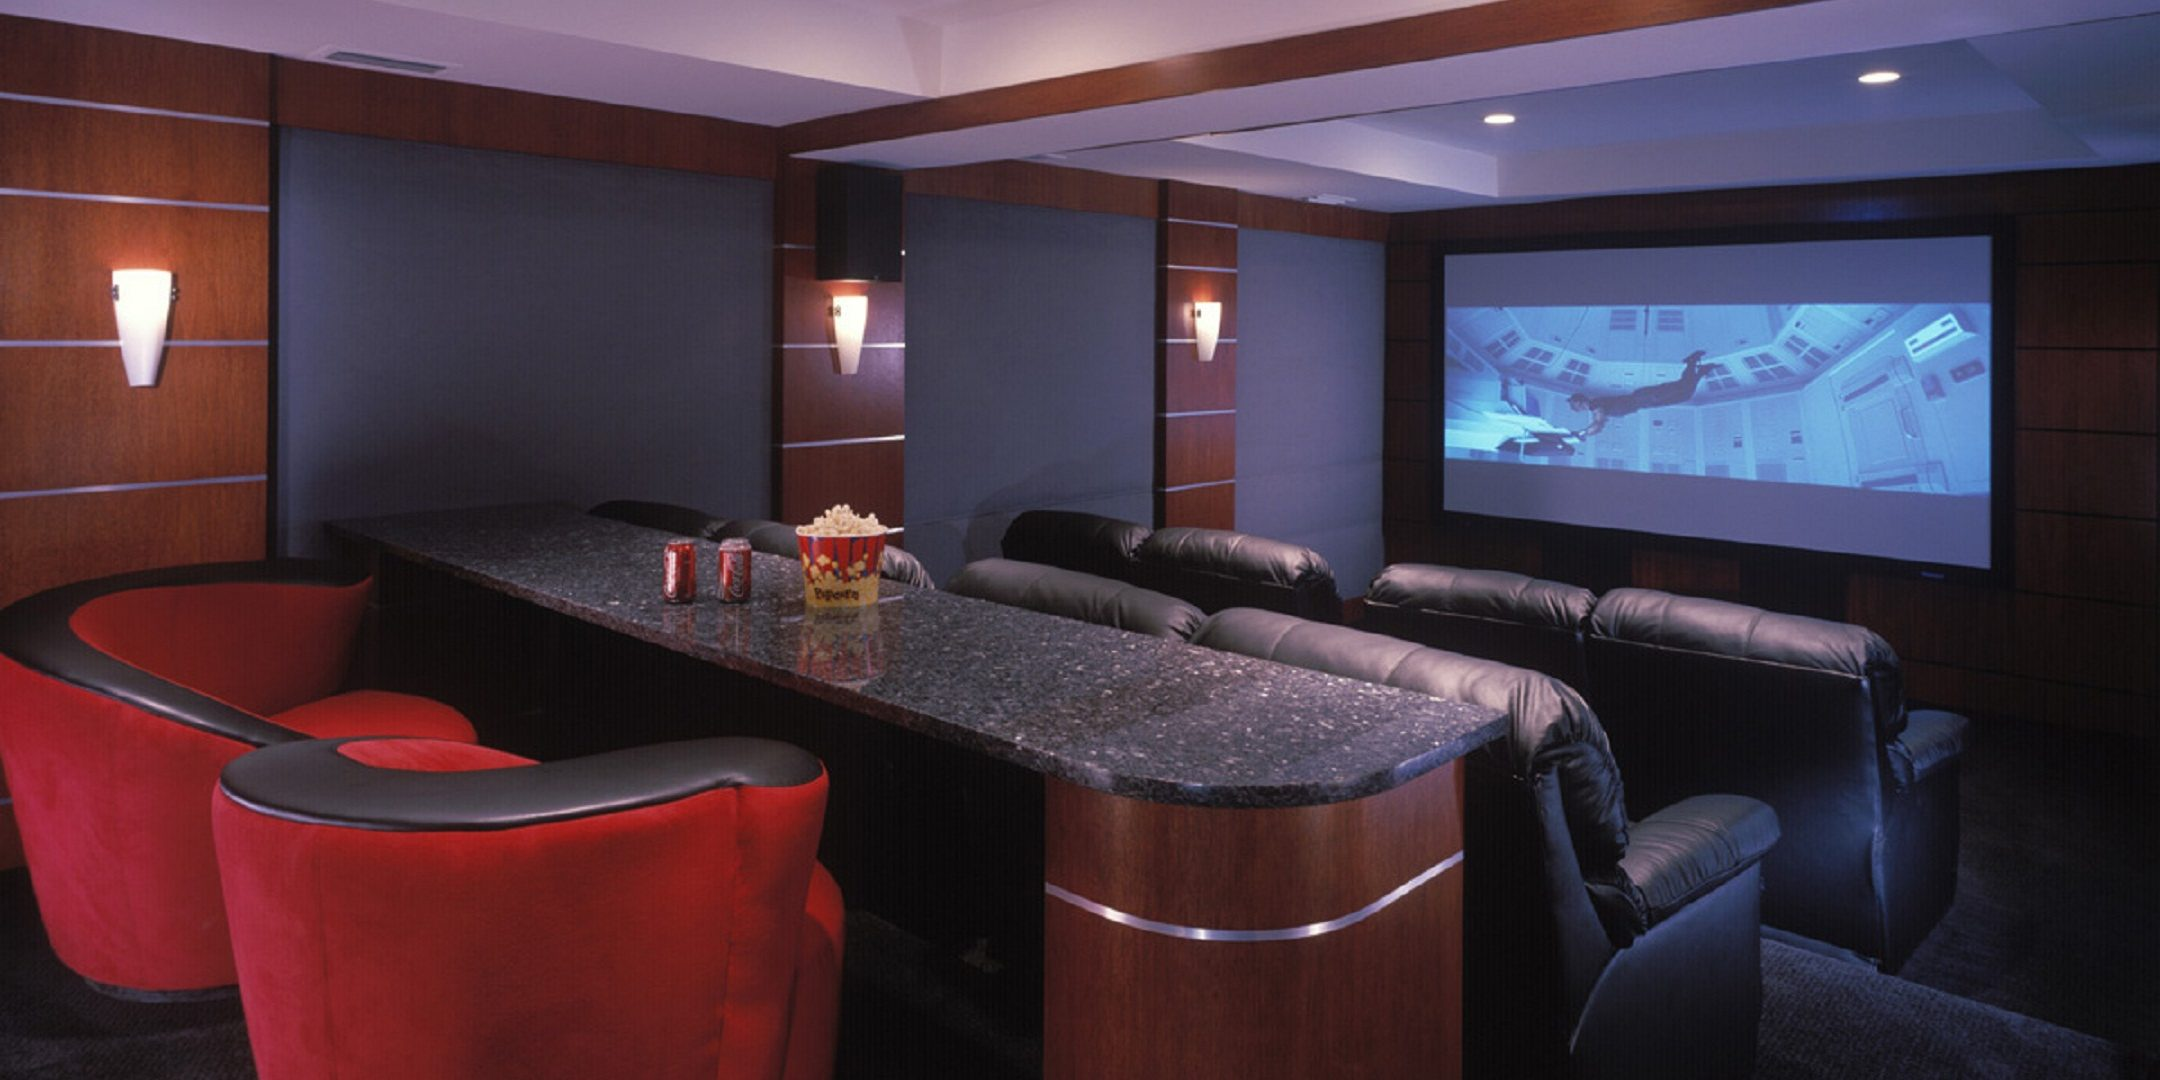 Custom Home Theatre We Design Your Dream Home Theatre Insta